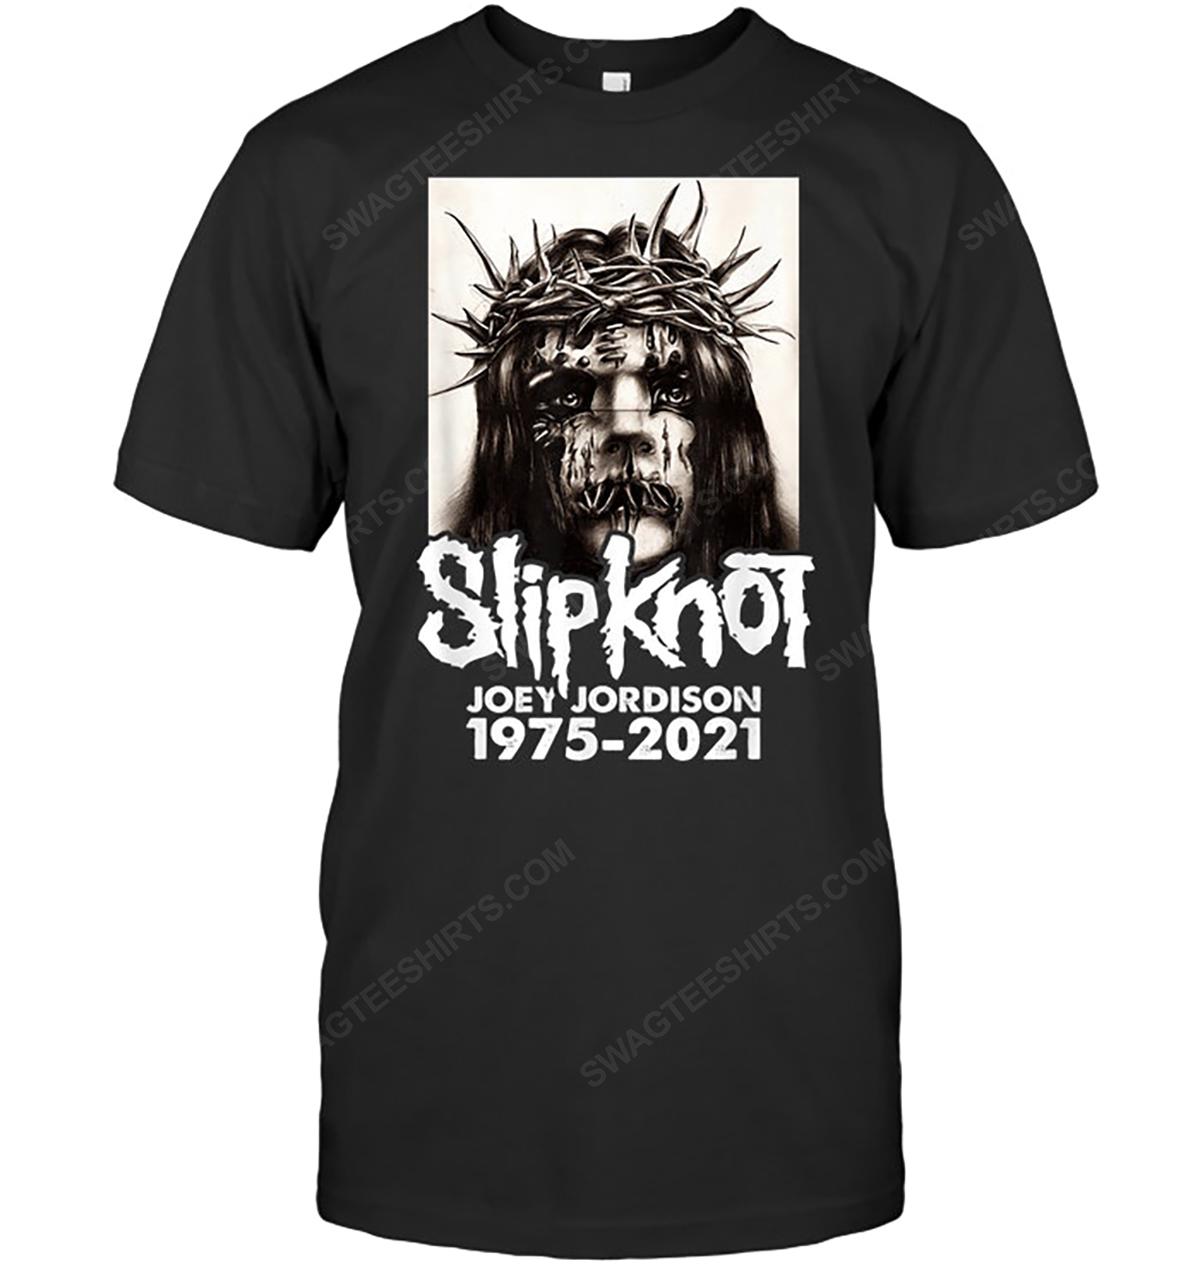 Rock band slipknot joey jordison 1975 2021 tshirt 1